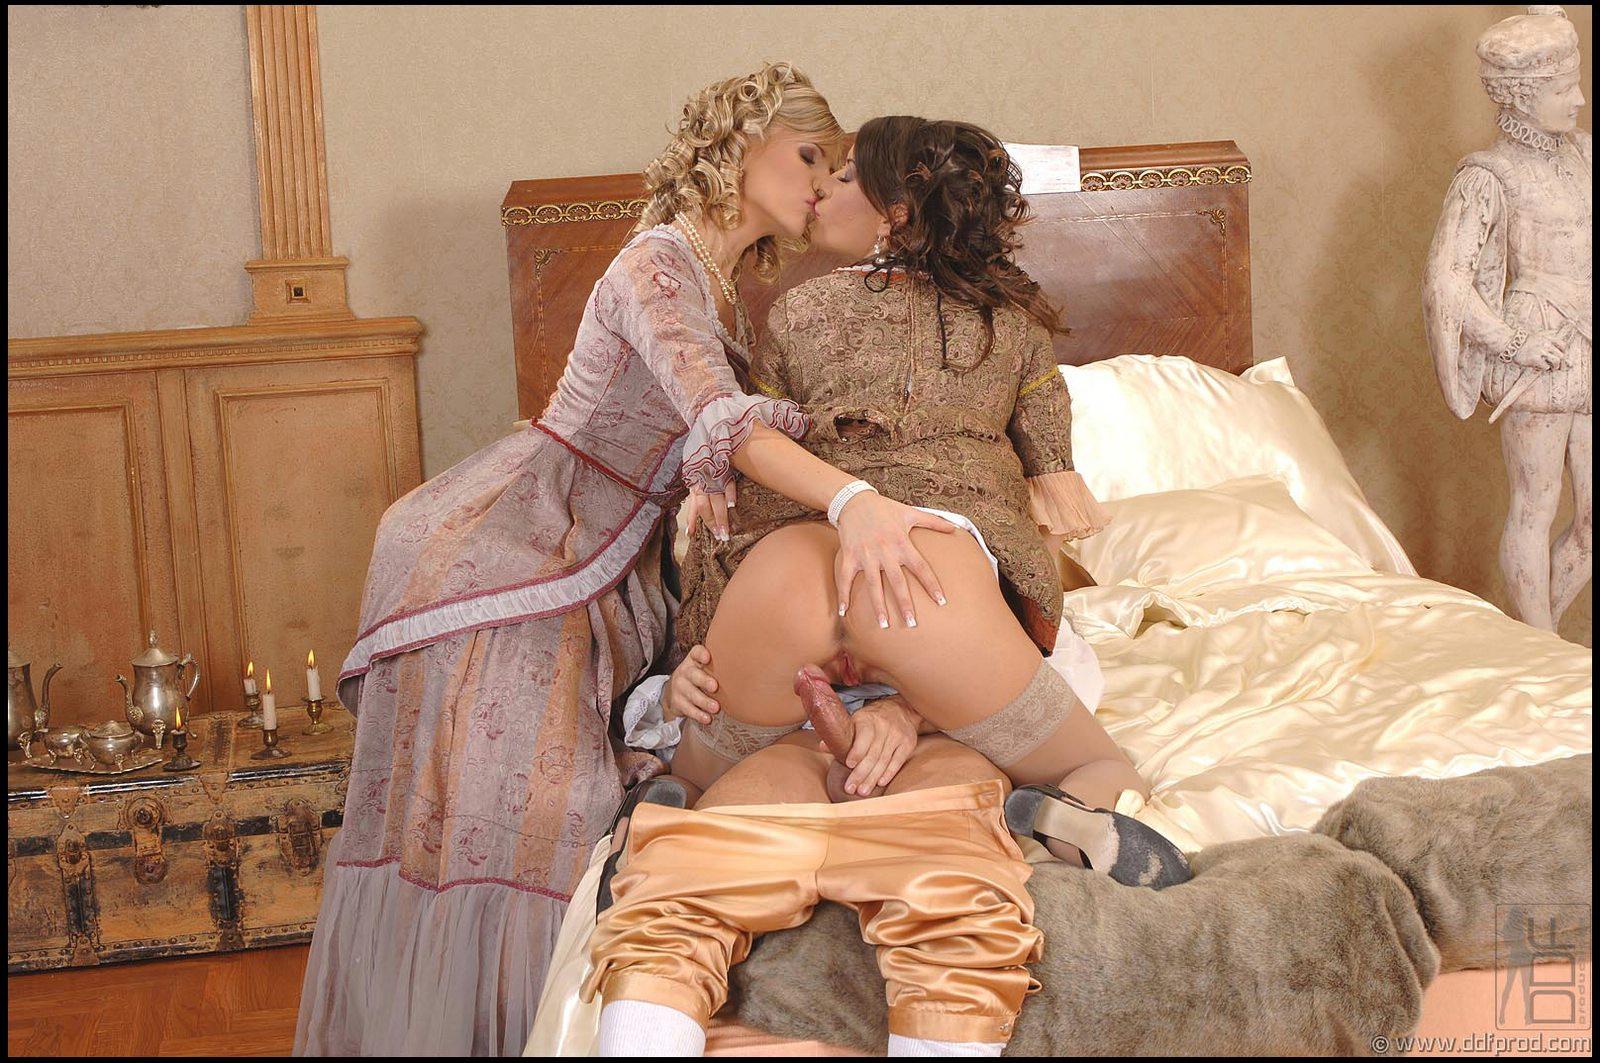 Косплей секс с Lora Craft и Tiffany Rousso порно фото бесплатно